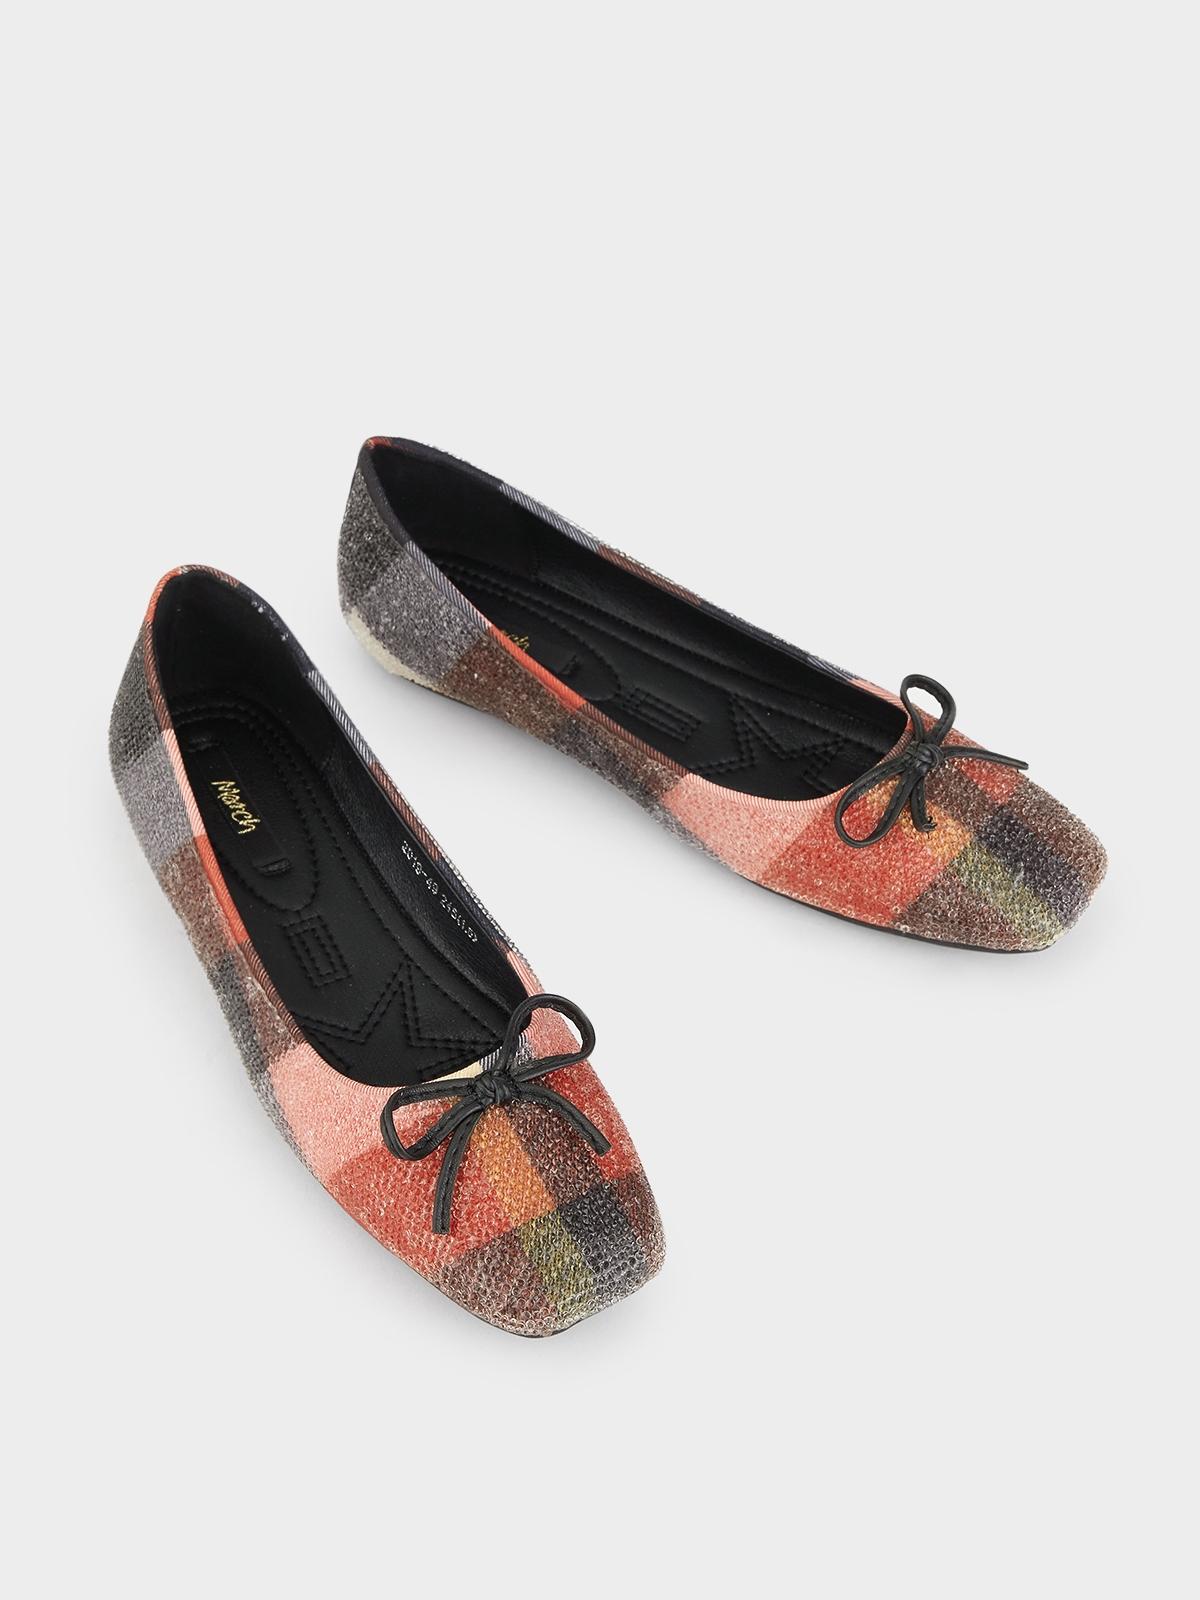 March Shoes Scotchy Flats Multi Color